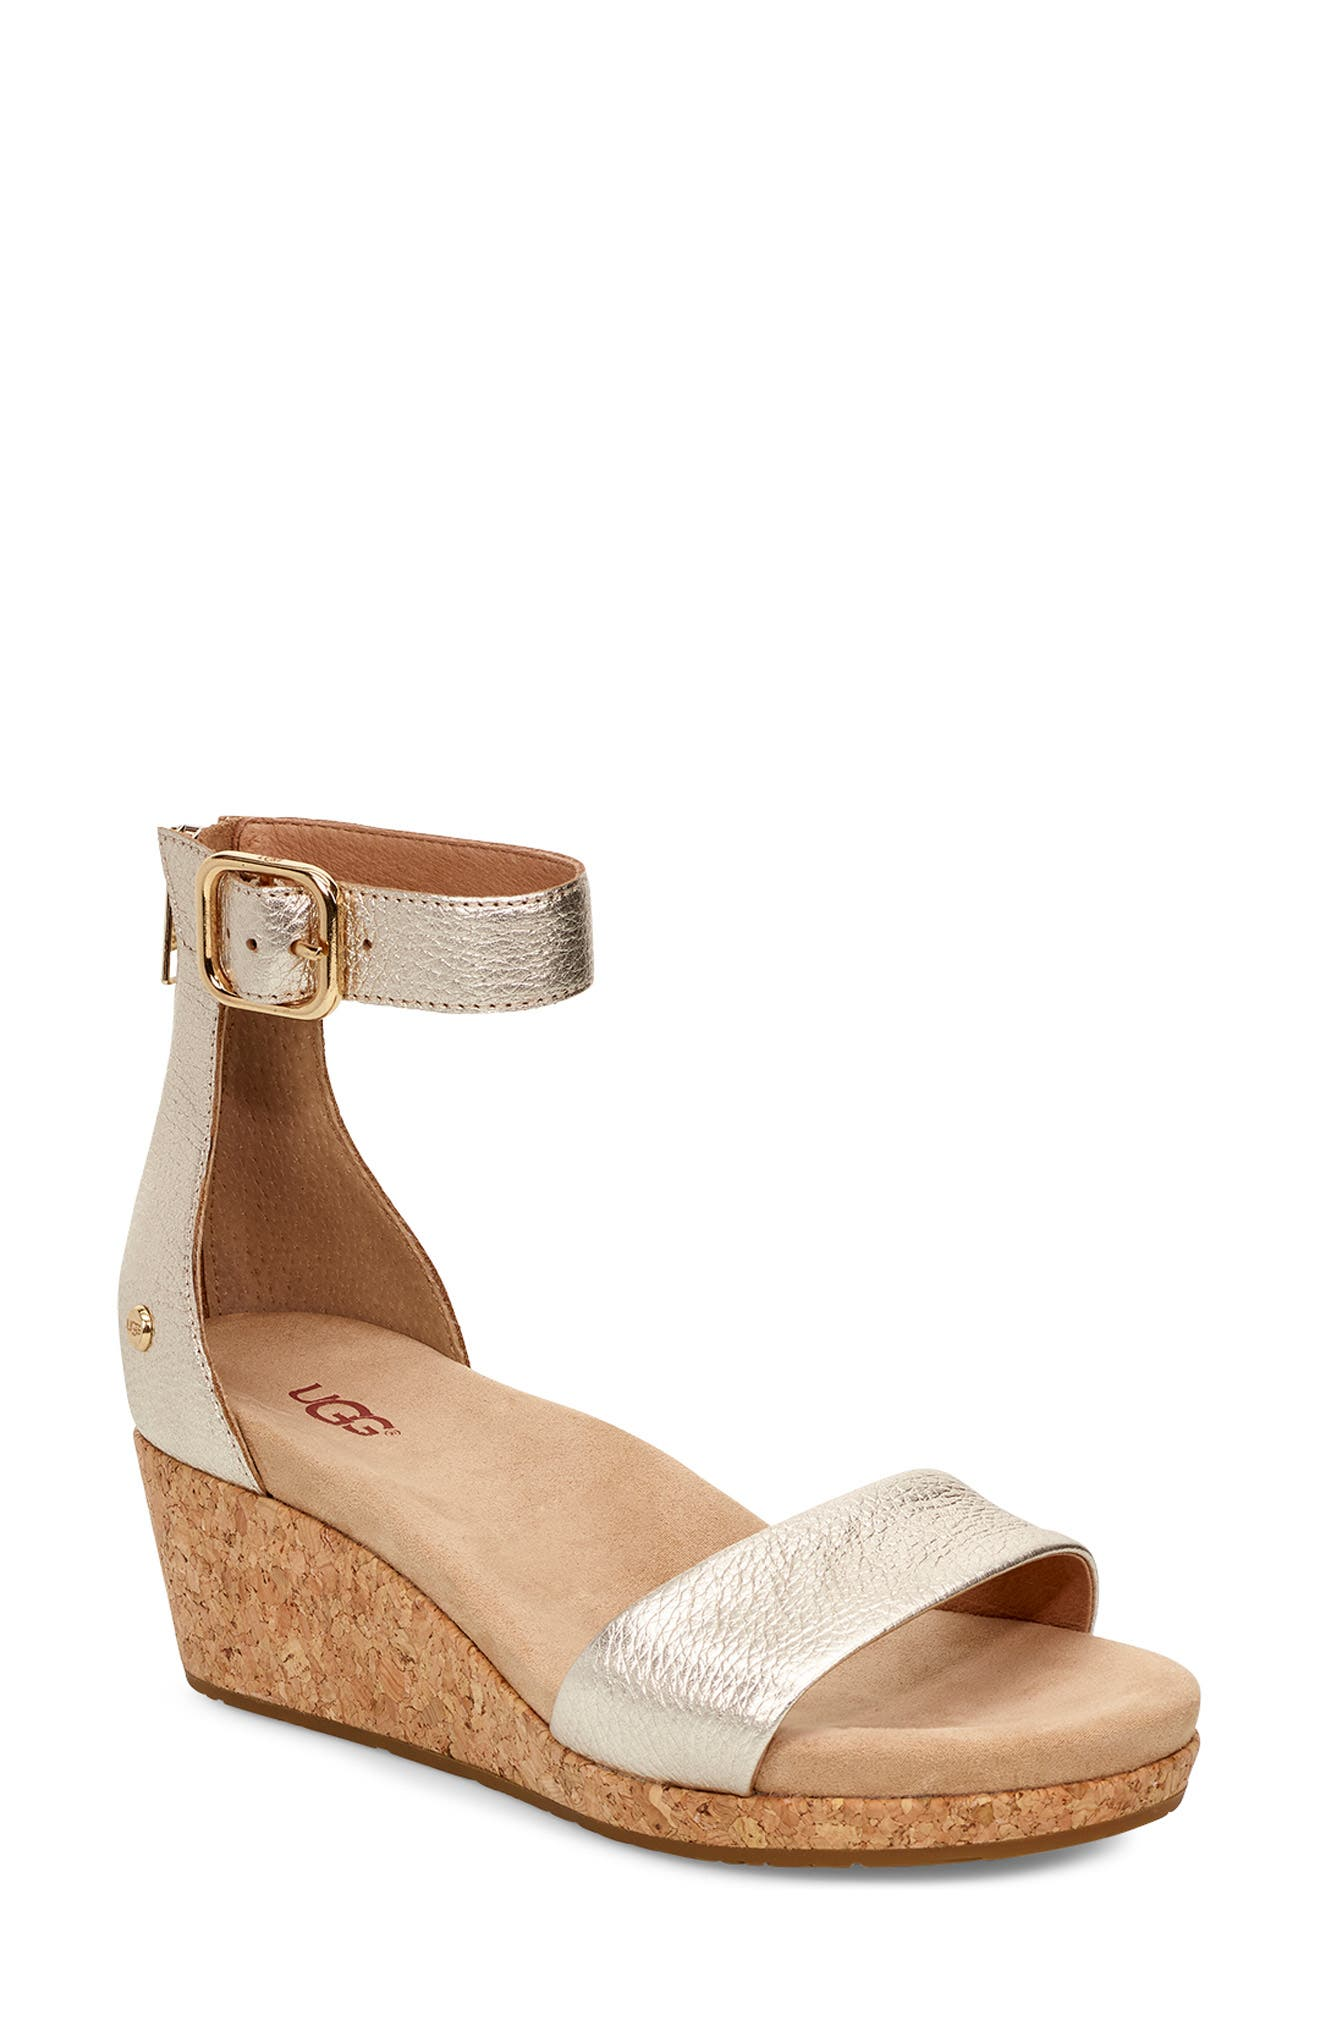 UGG<SUP>®</SUP> Zoe II Metallic Wedge Sandal, Main, color, GOLD LEATHER